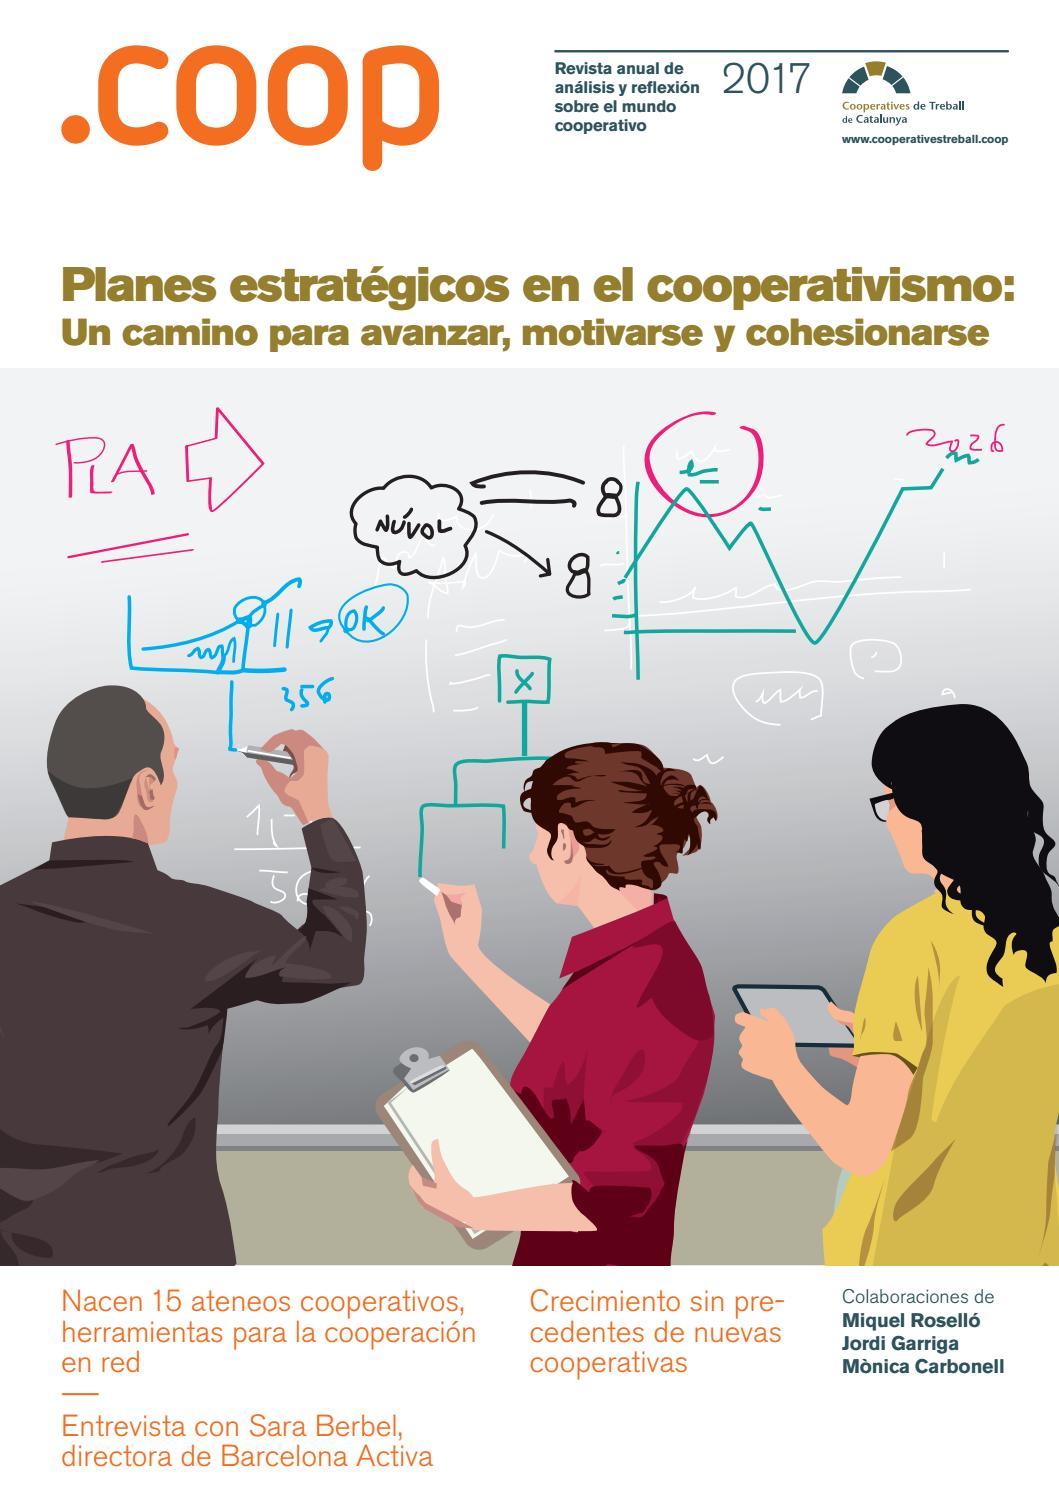 Revista Coop 2017 en español by Cooperatives Treball - issuu